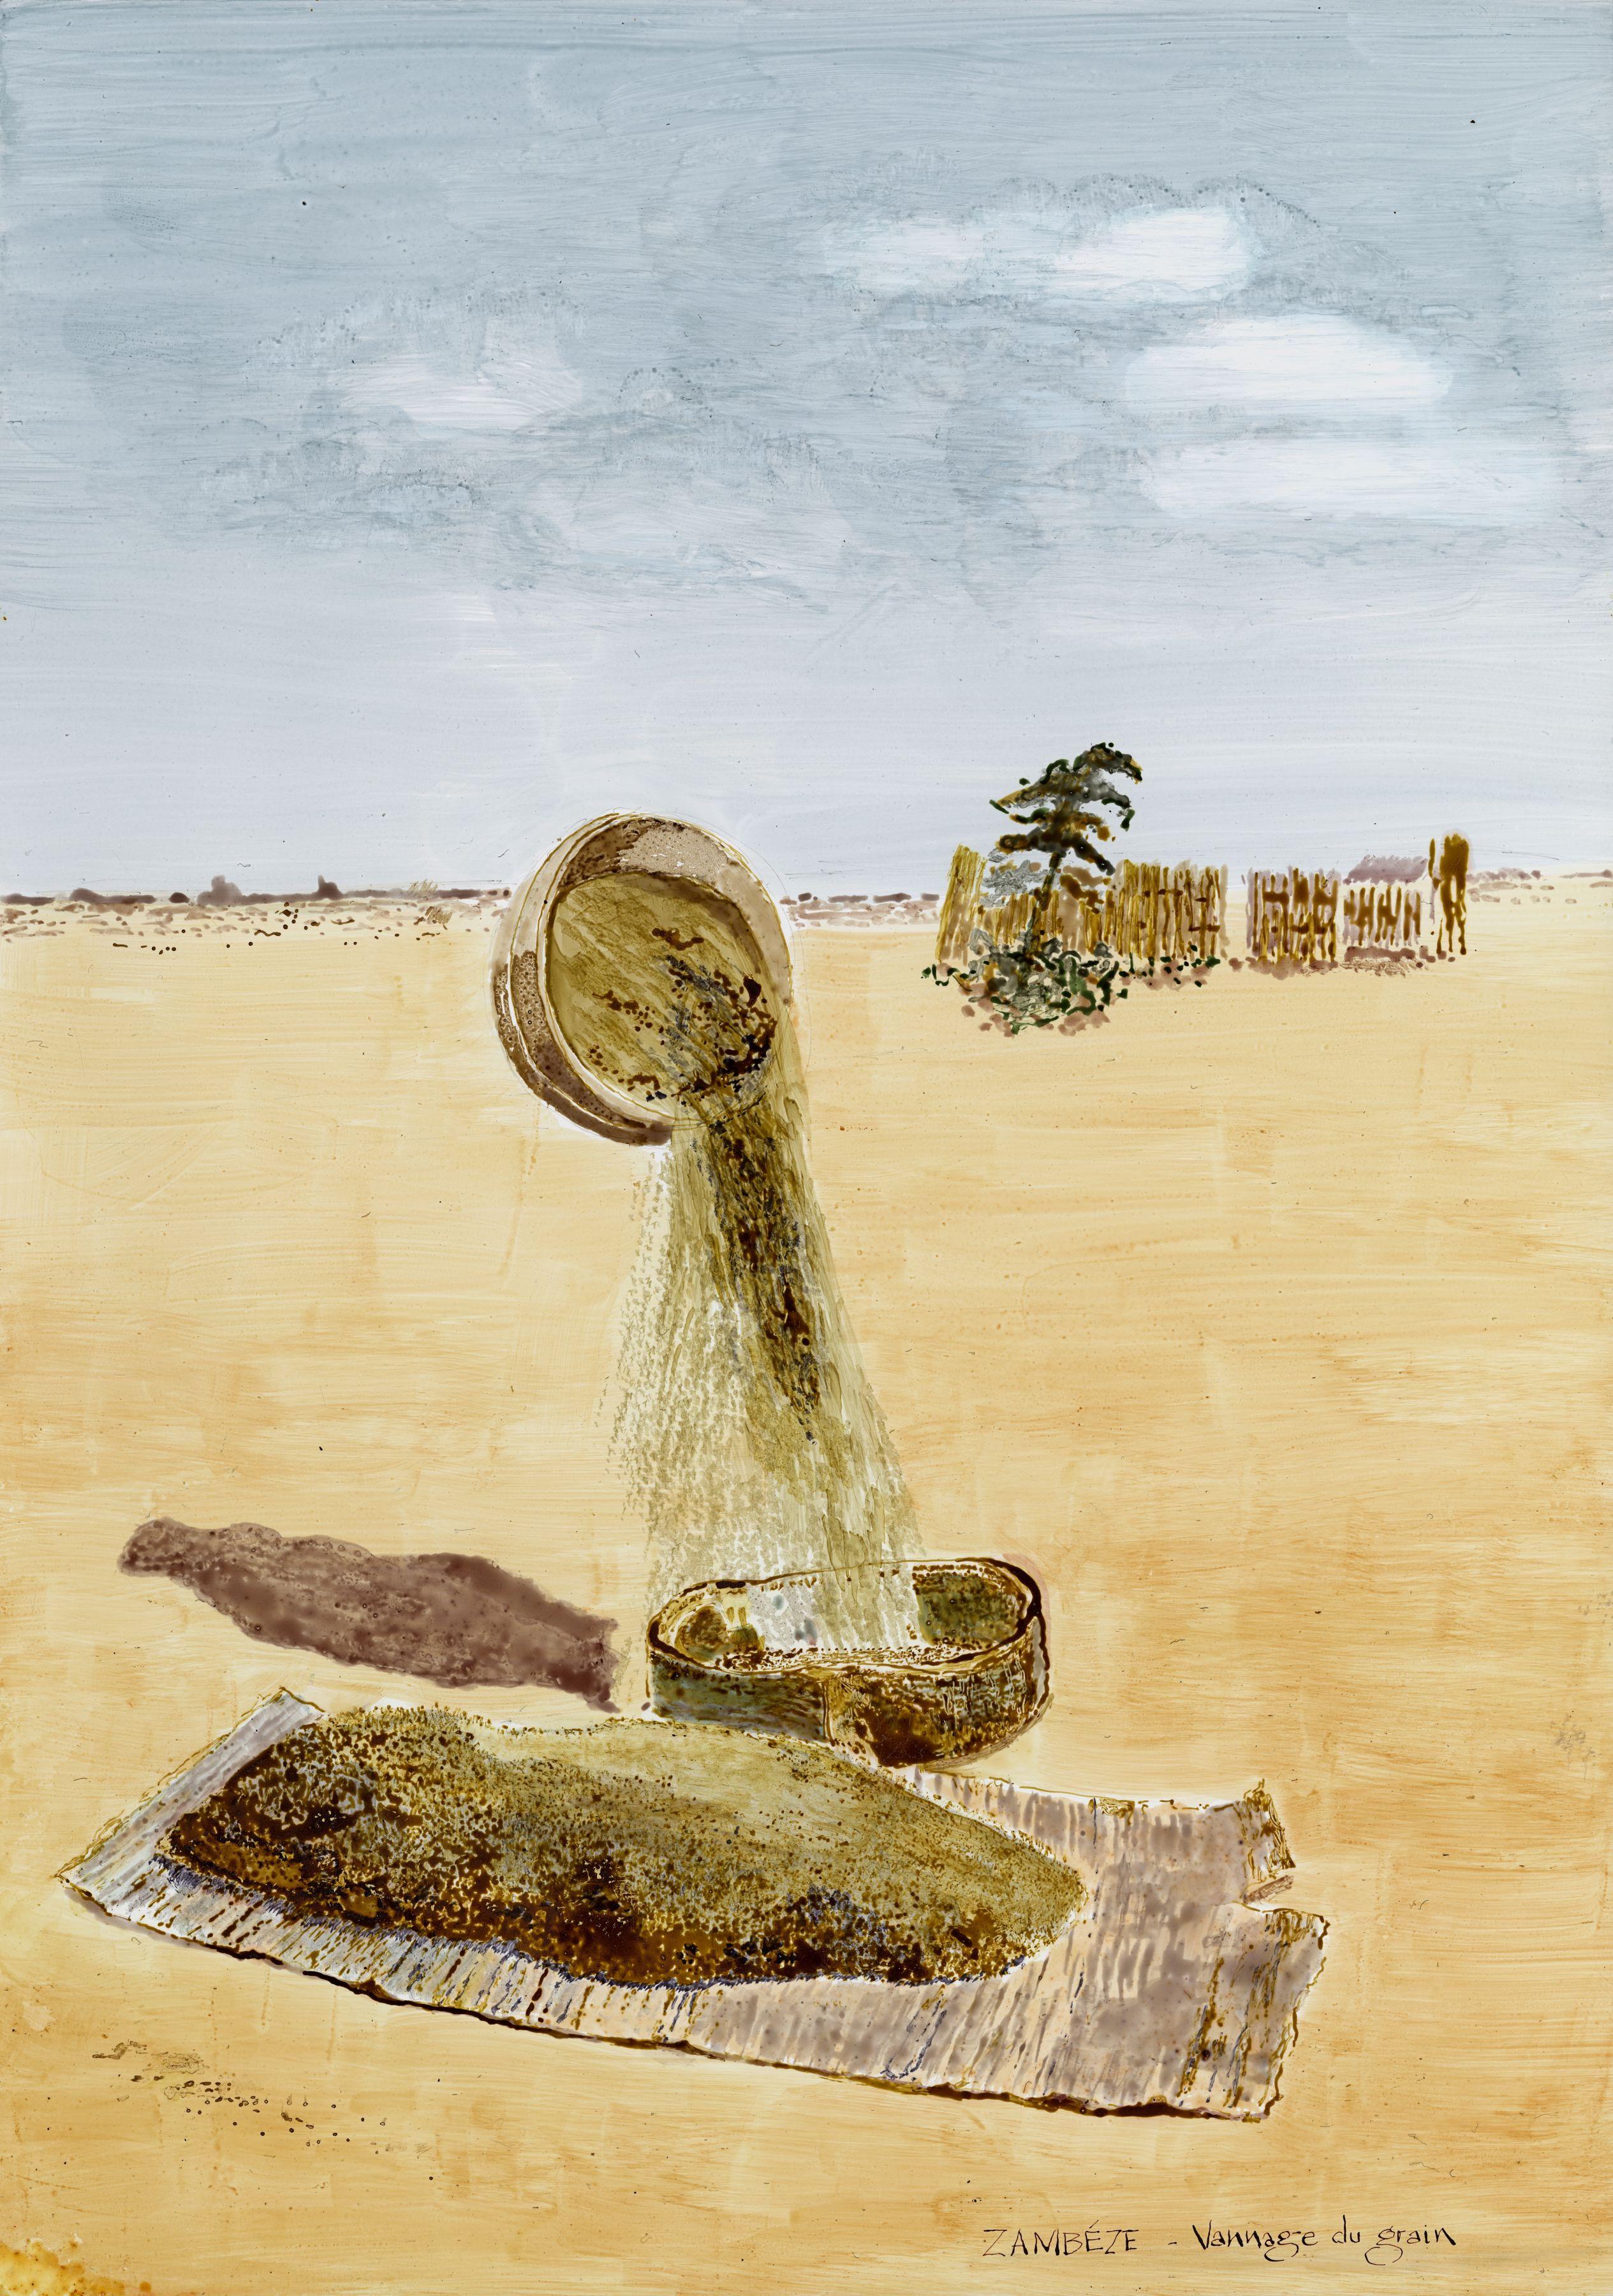 Sifting the grain, Zambeze artwork